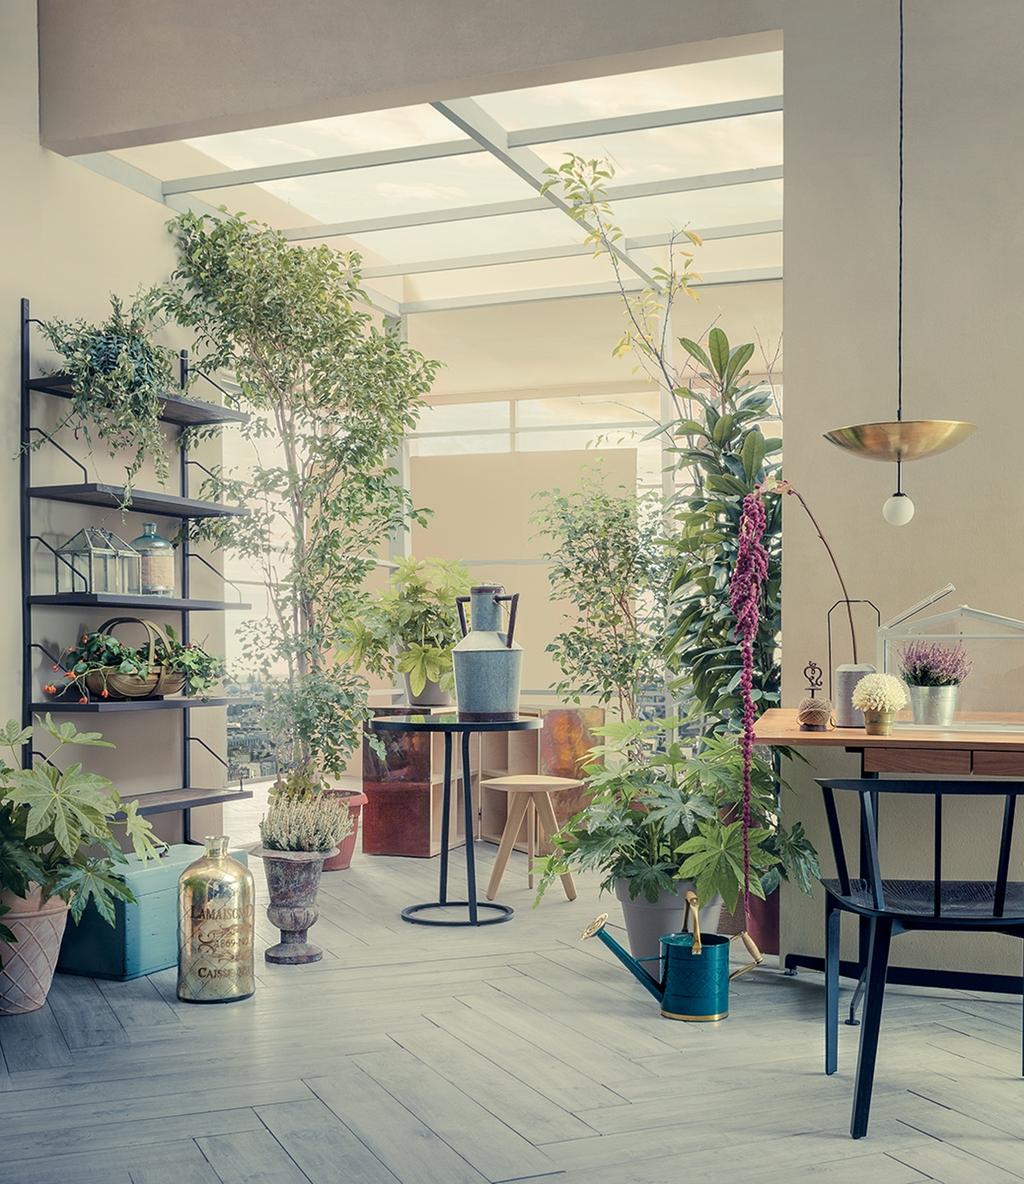 Up down     pendant light   | 117OL-P01 Studio Tenshi - 3 house plants Atmospheric room